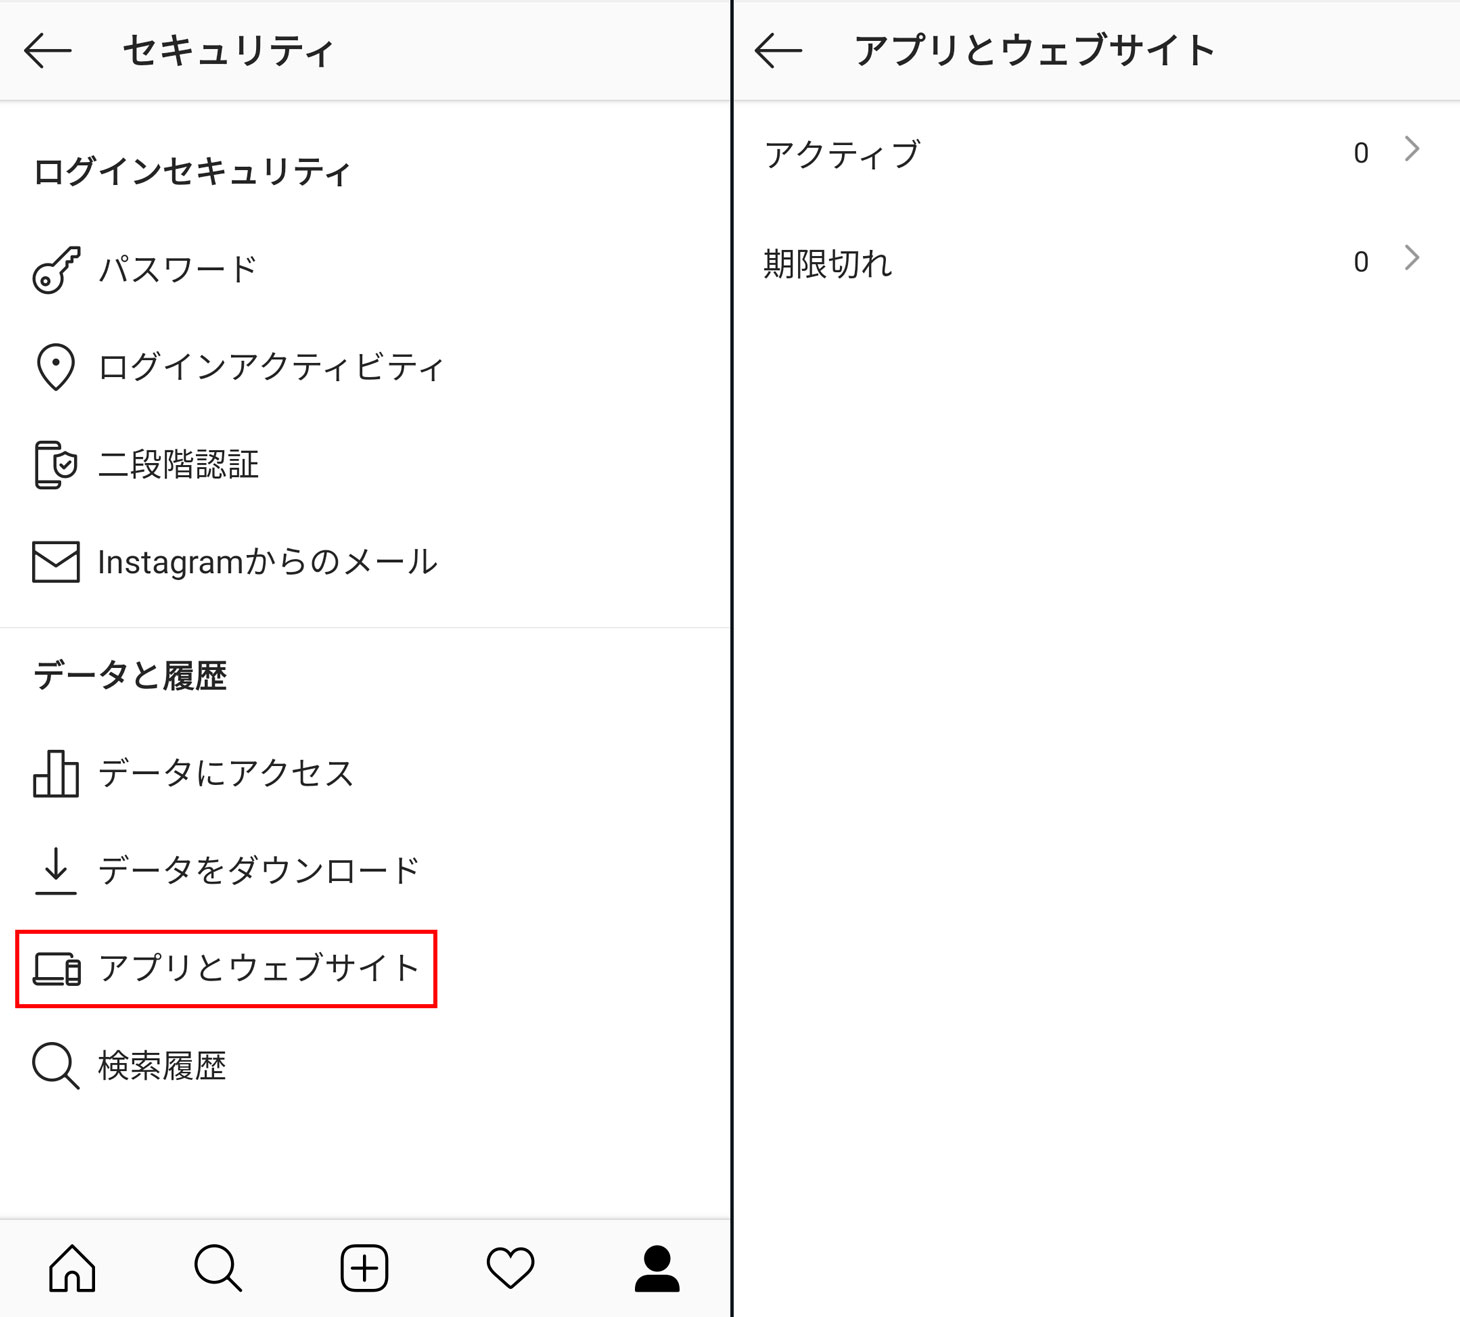 Instagramアカウントに接続されているアプリを確認する方法